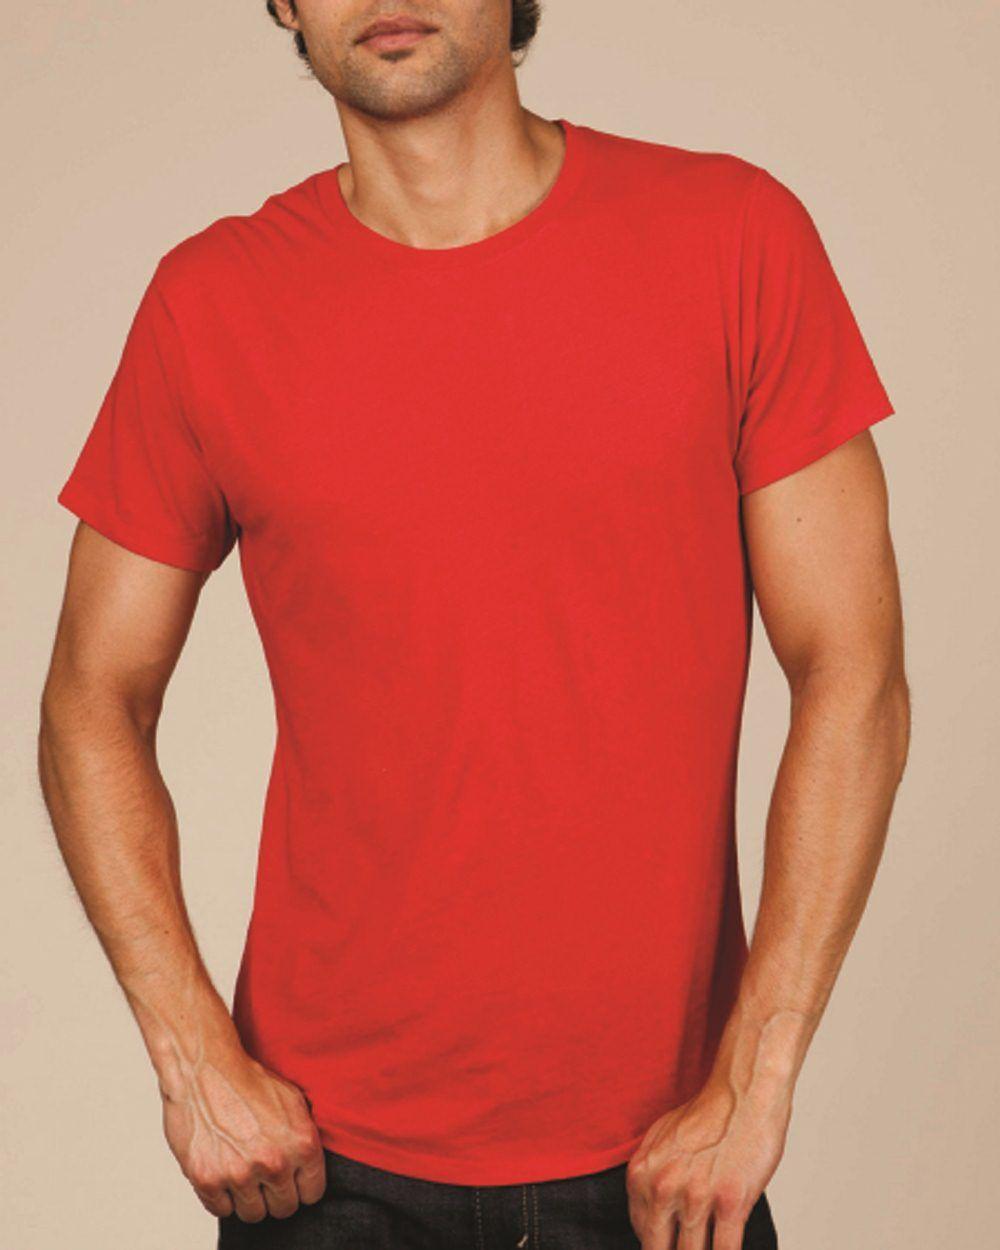 kaalulangus t shirti ideed rasva poletamine massaazioli